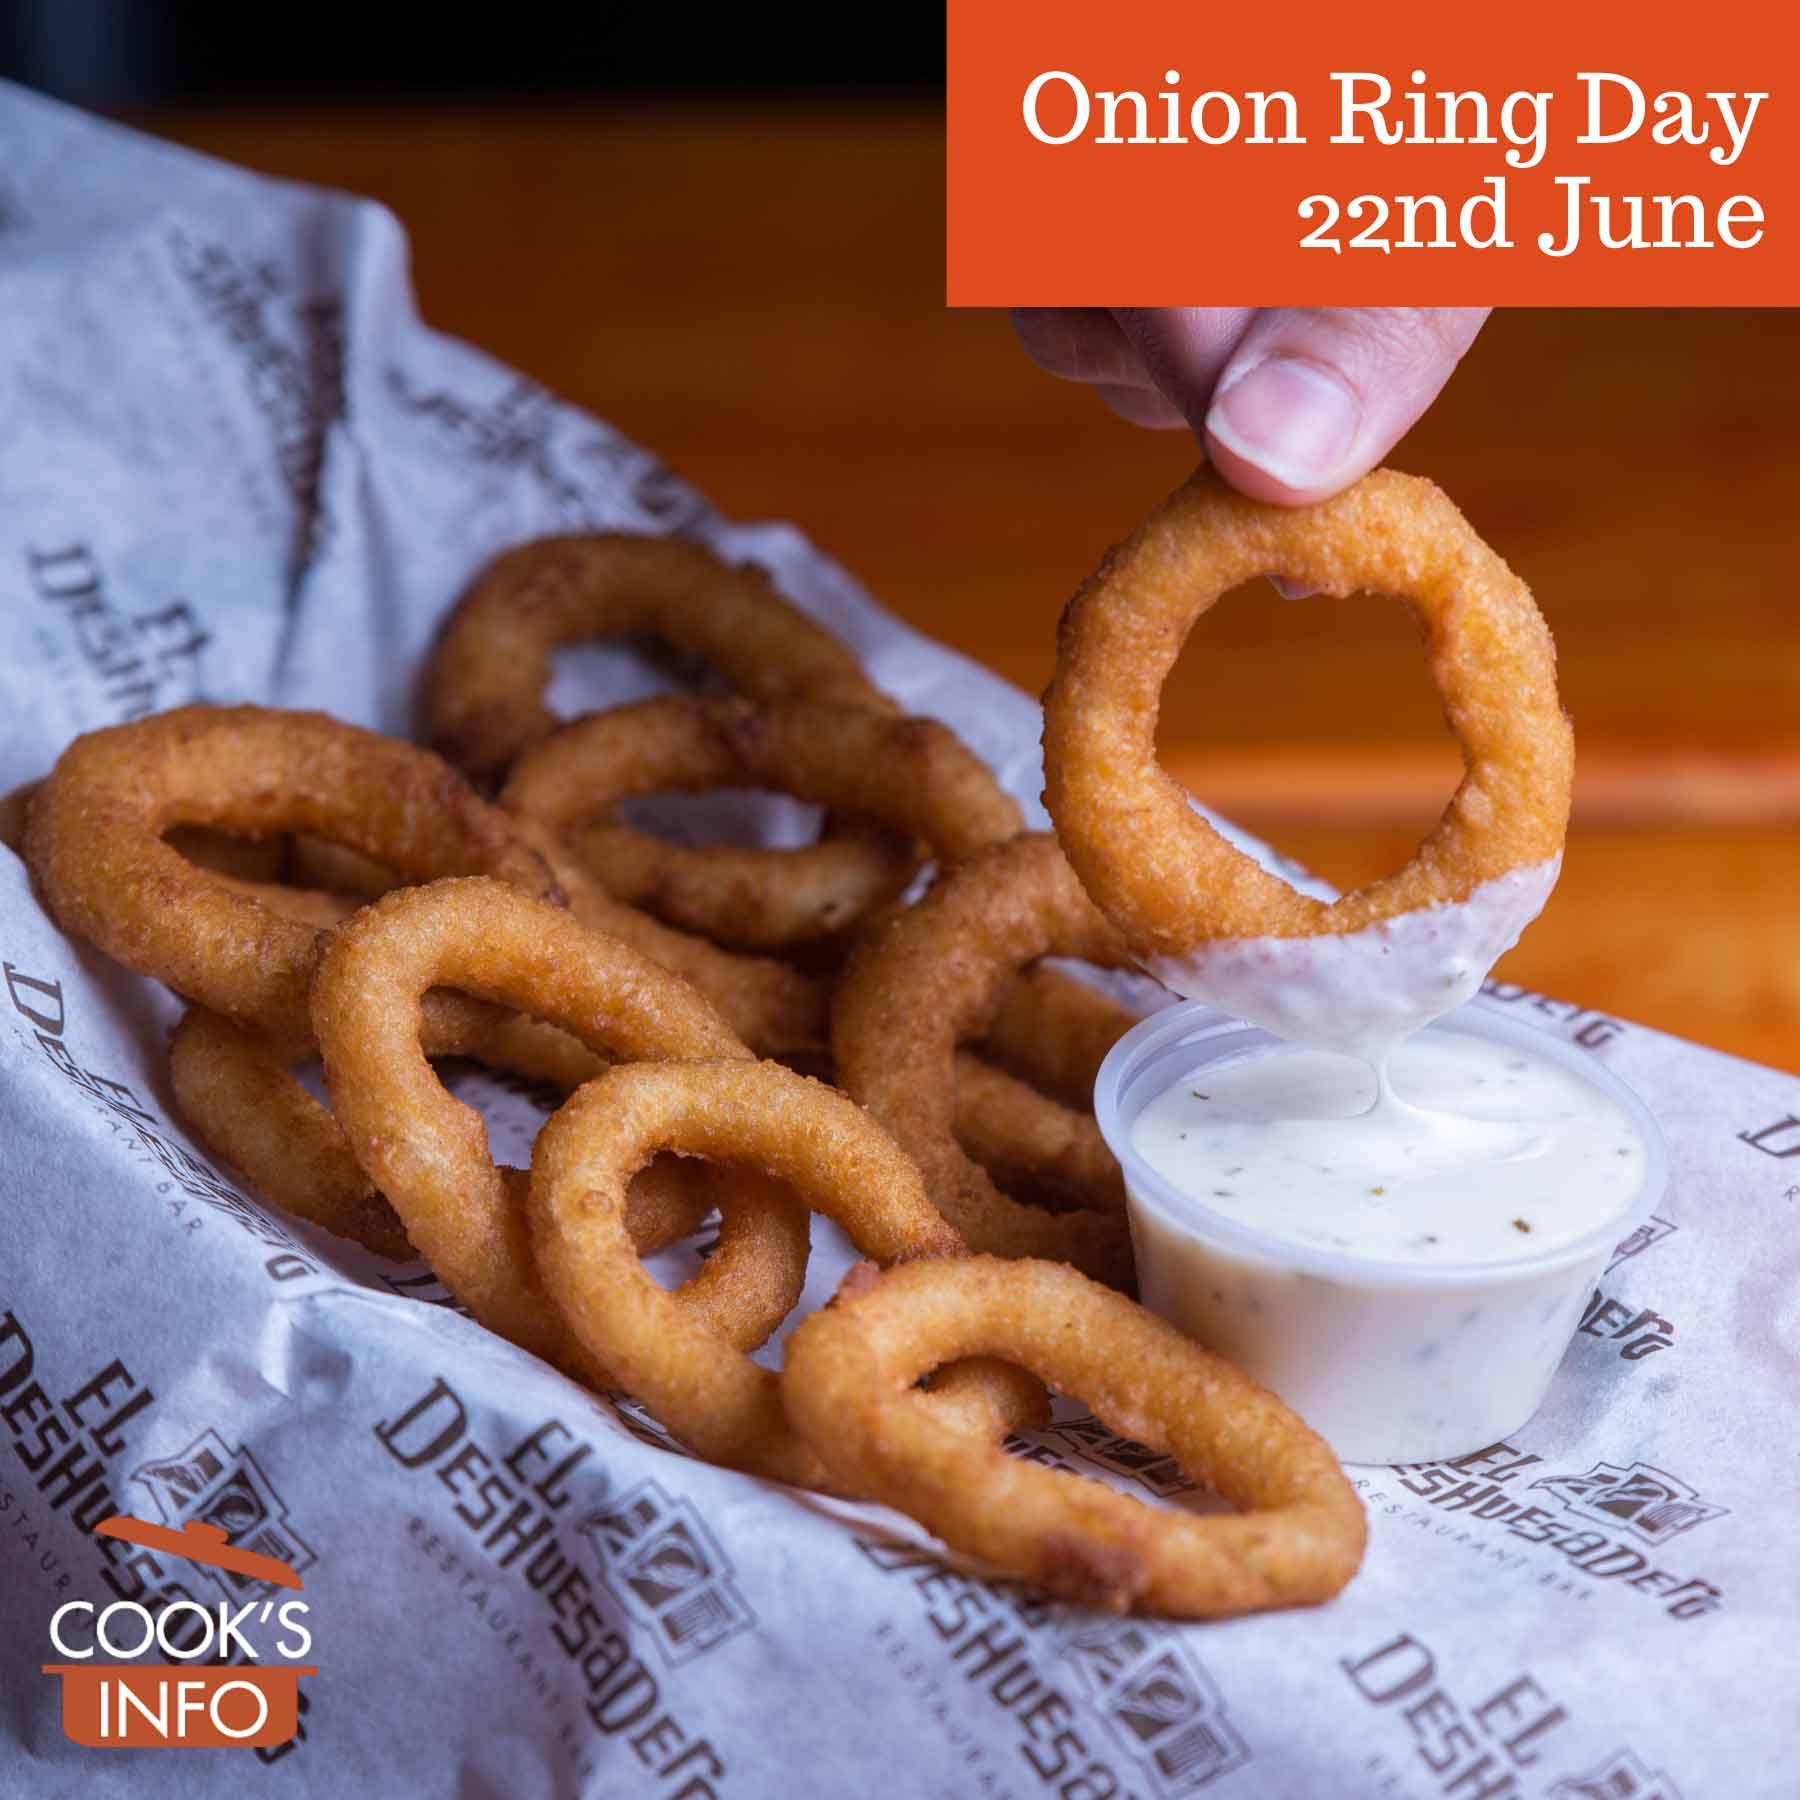 Basket of onion rings